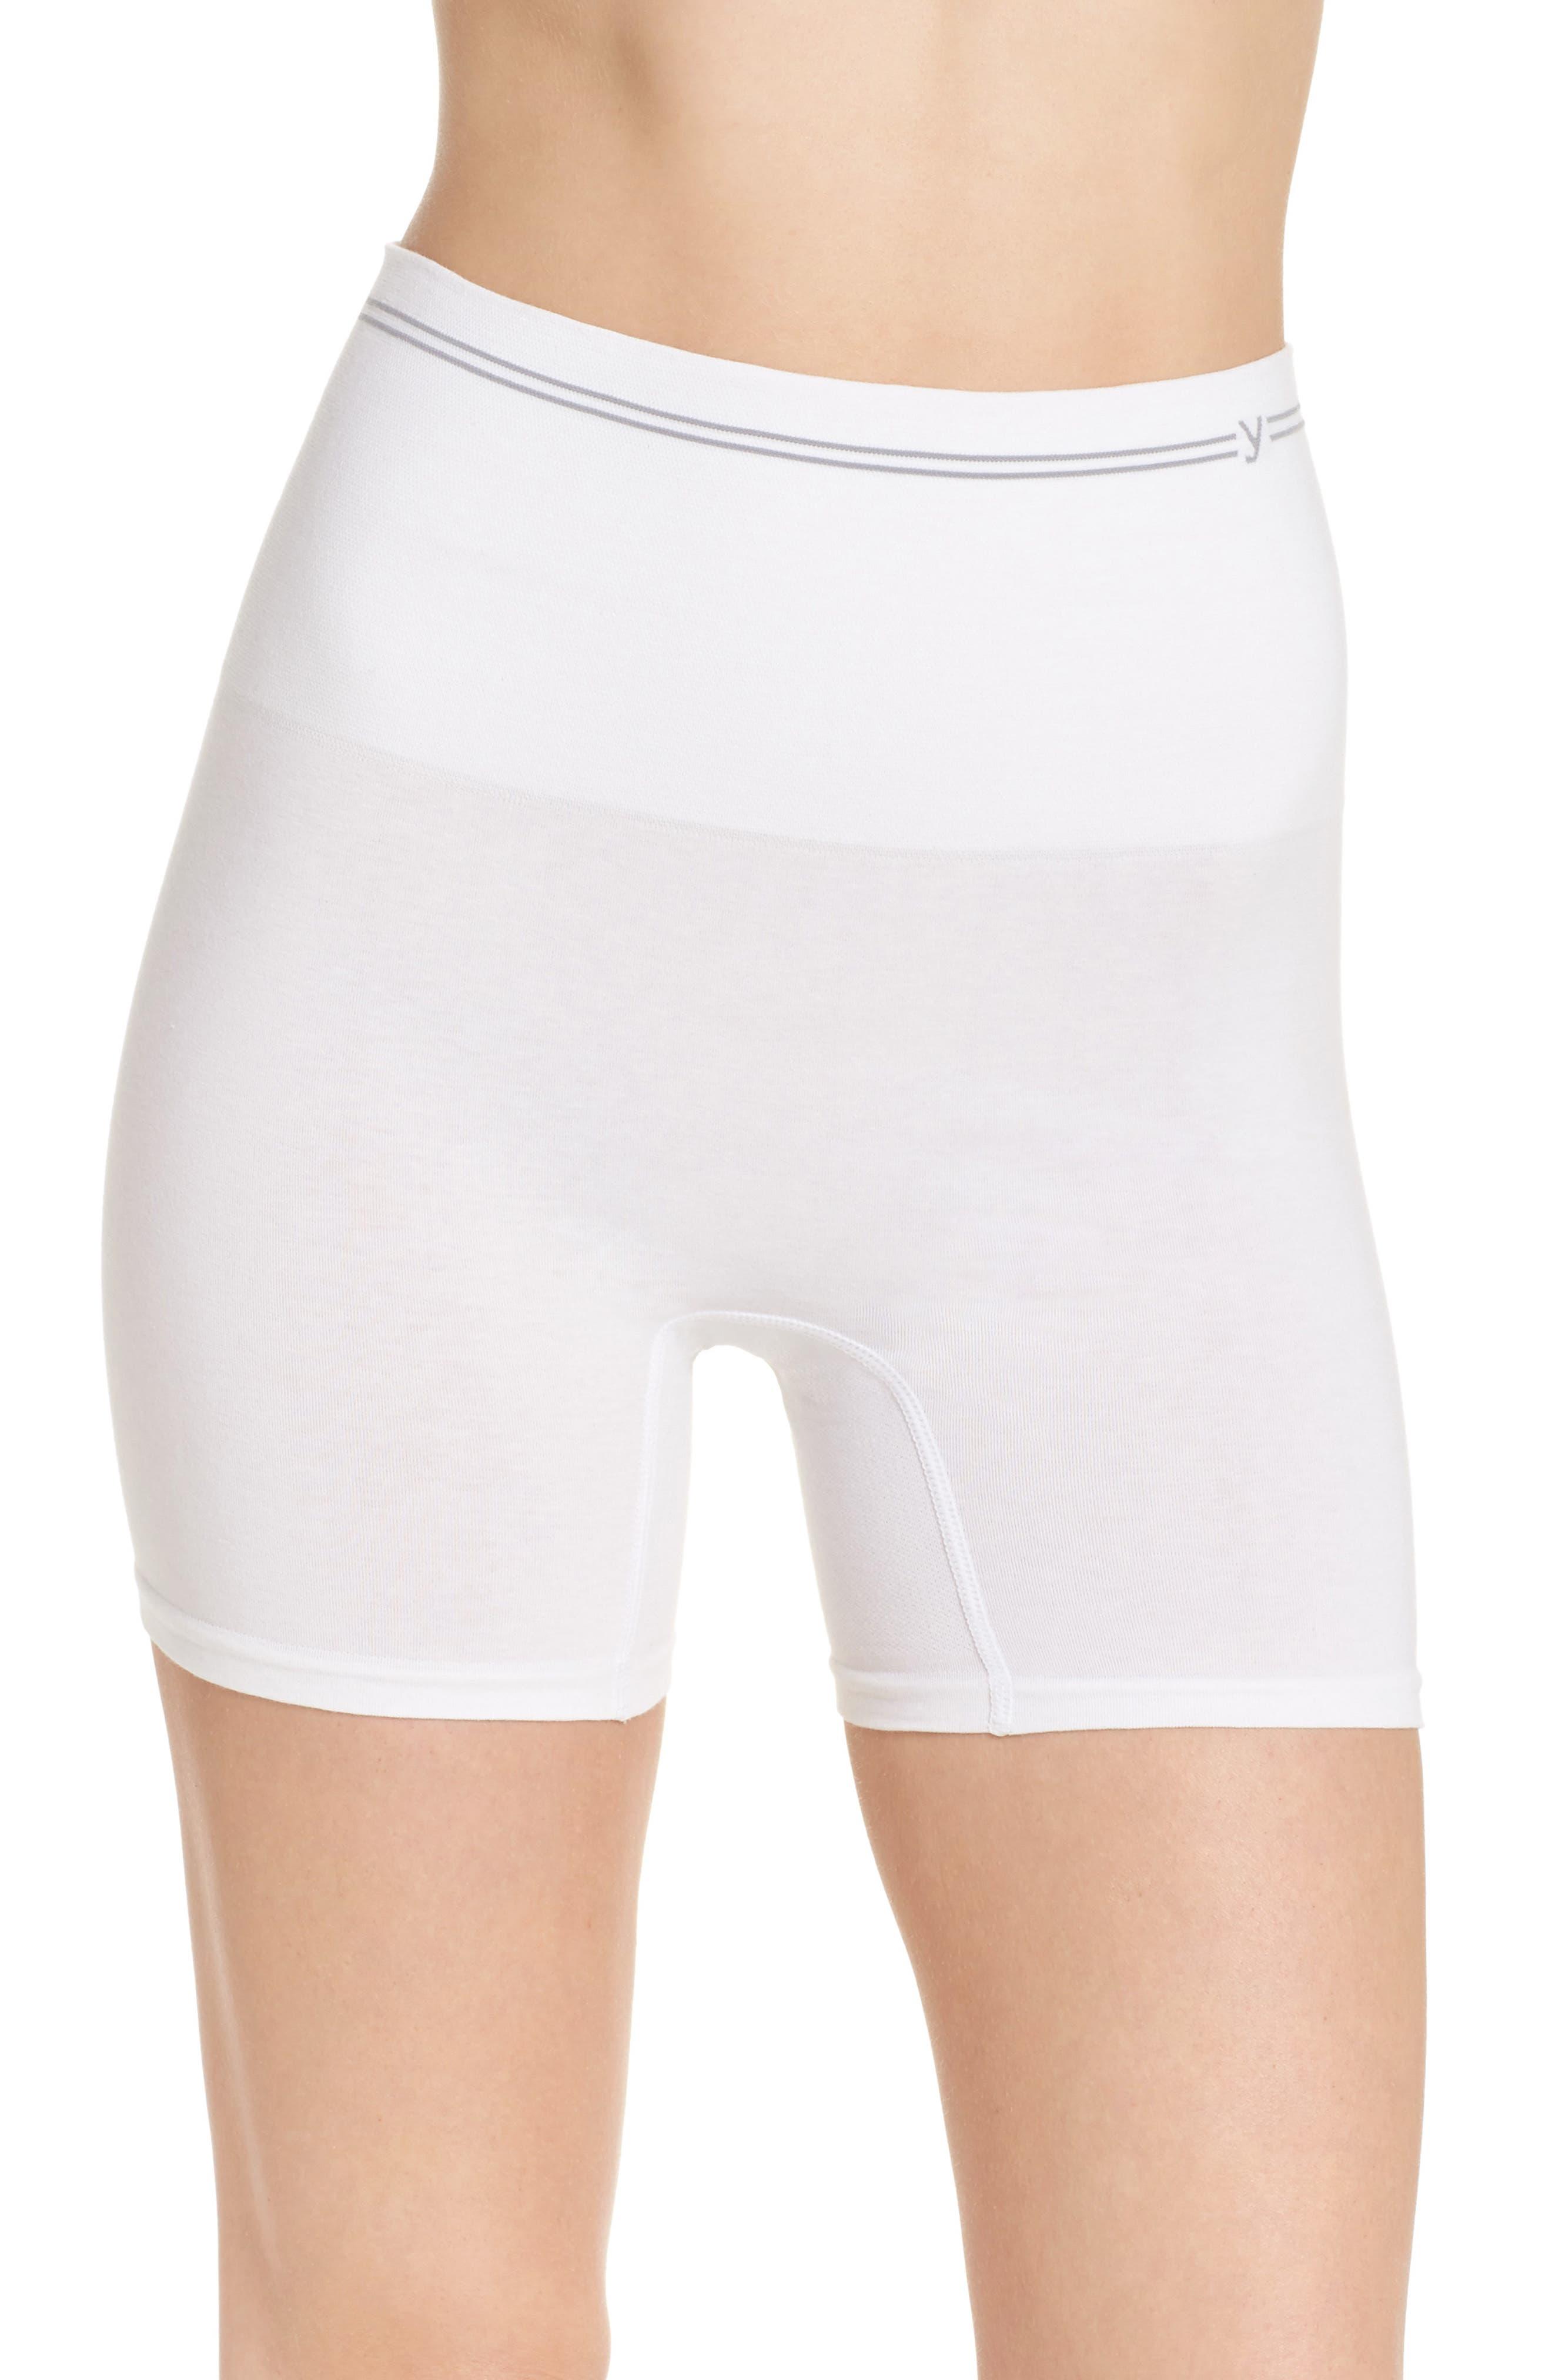 Seamless Shaping Shorts,                         Main,                         color, White